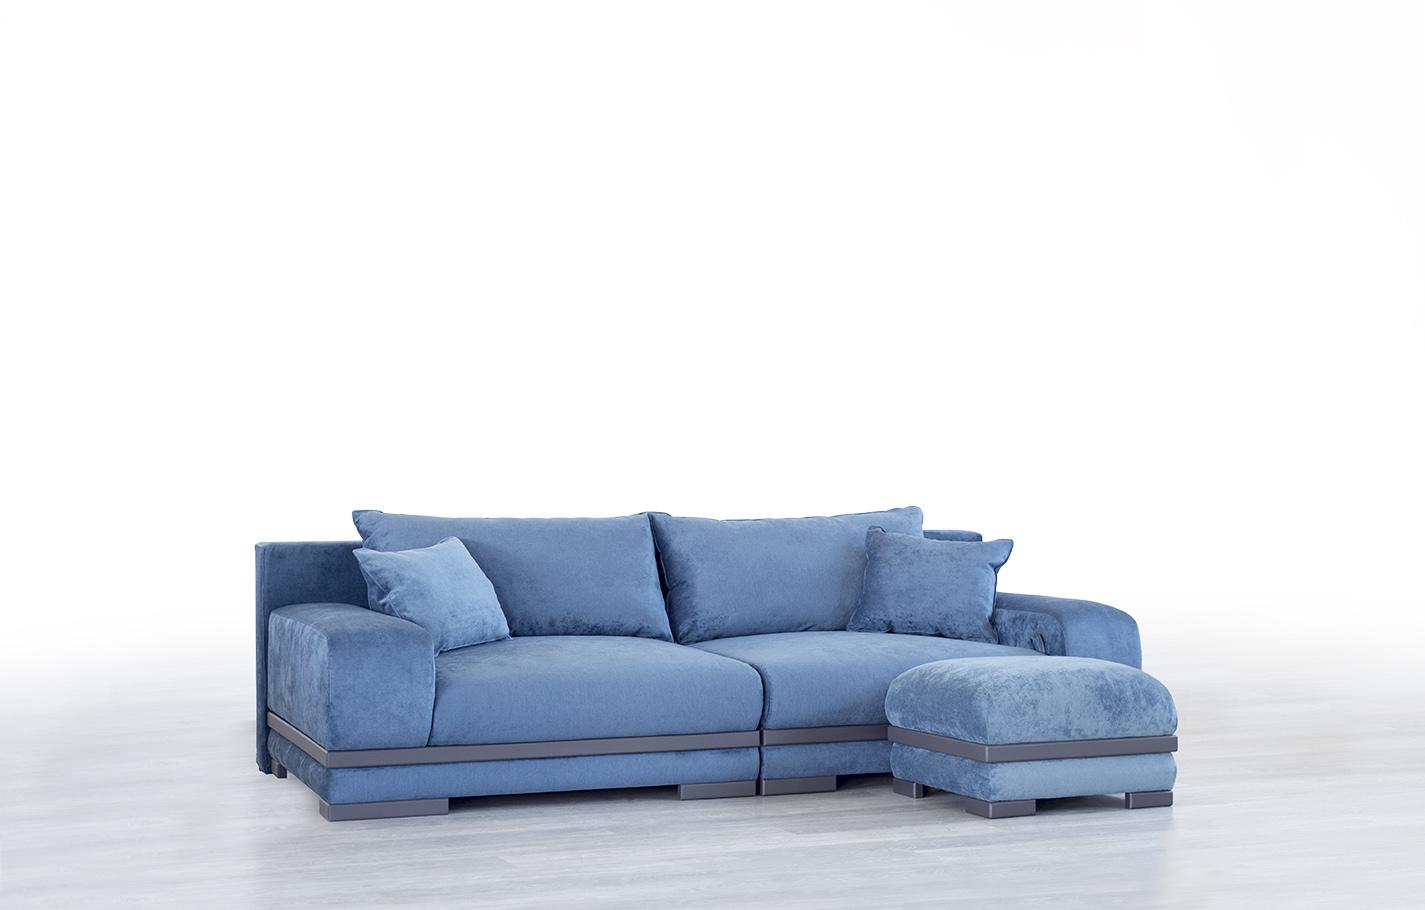 sofa_komfort-2_7